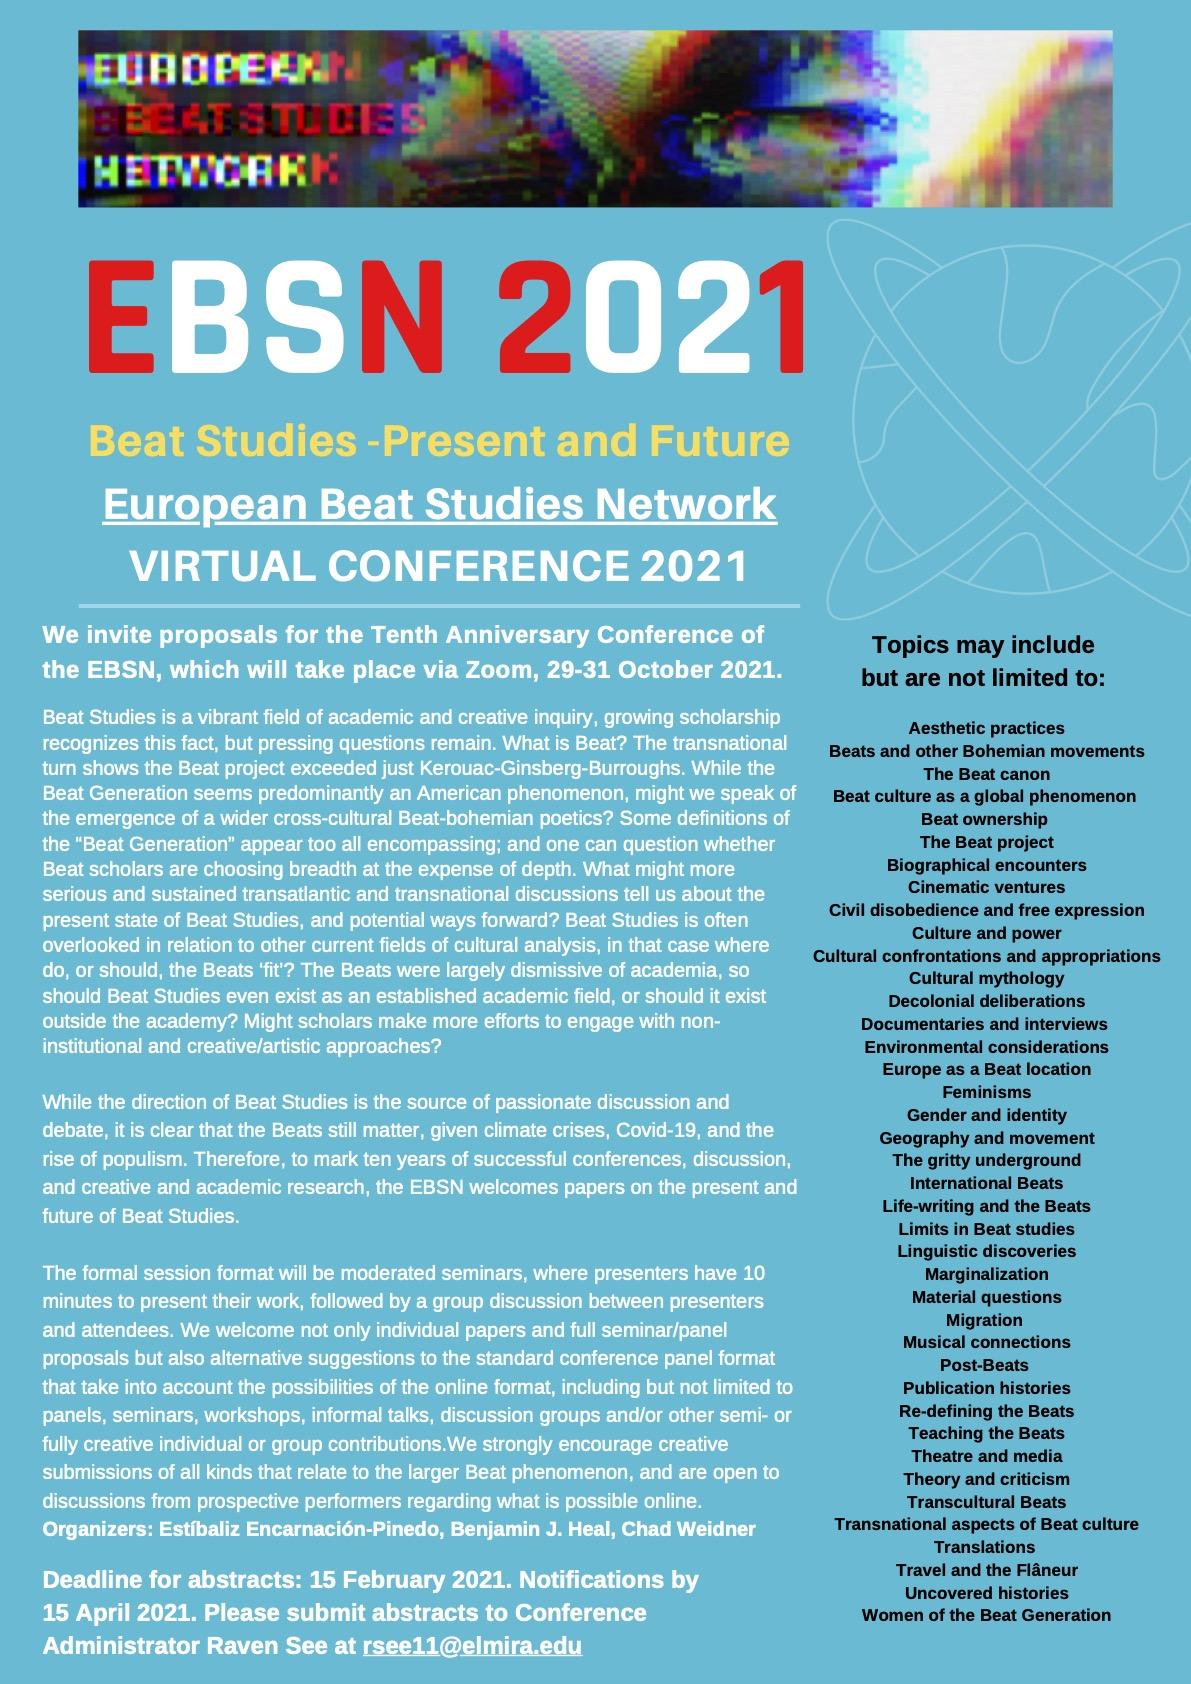 EBSN 2021